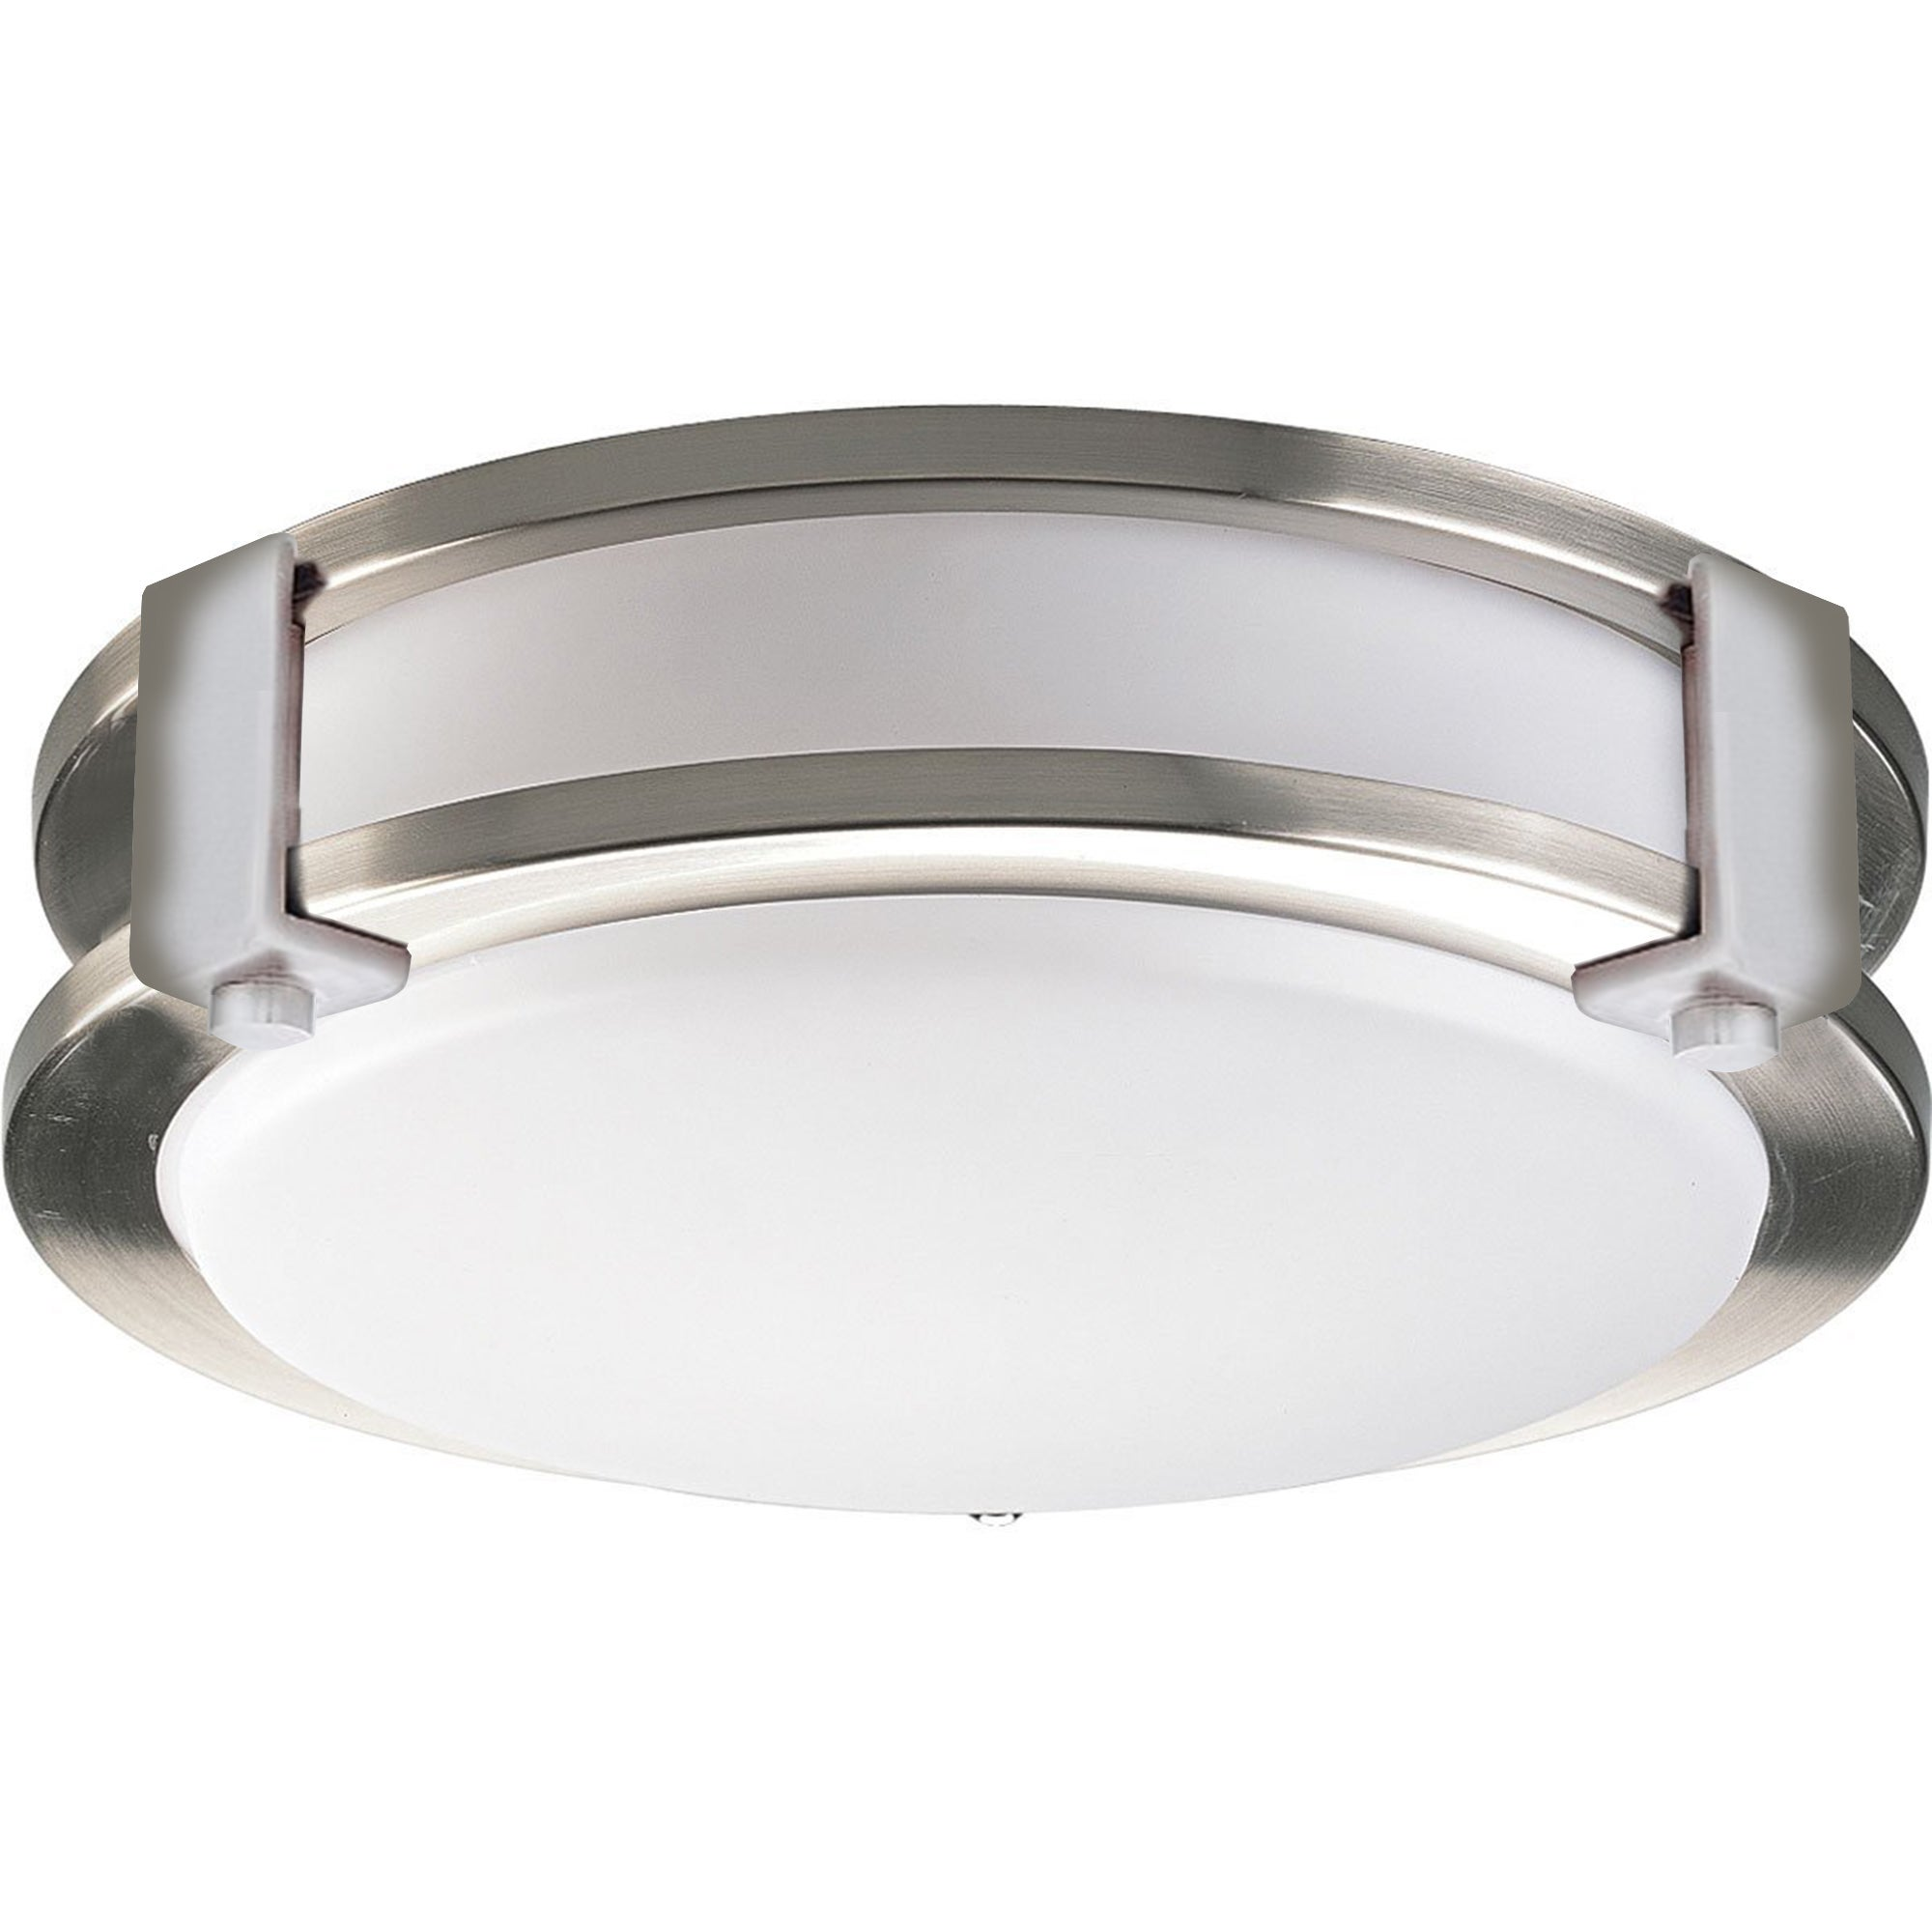 Y-Decor Euro Satin Nickel Steel with Acrylic Decorative F...